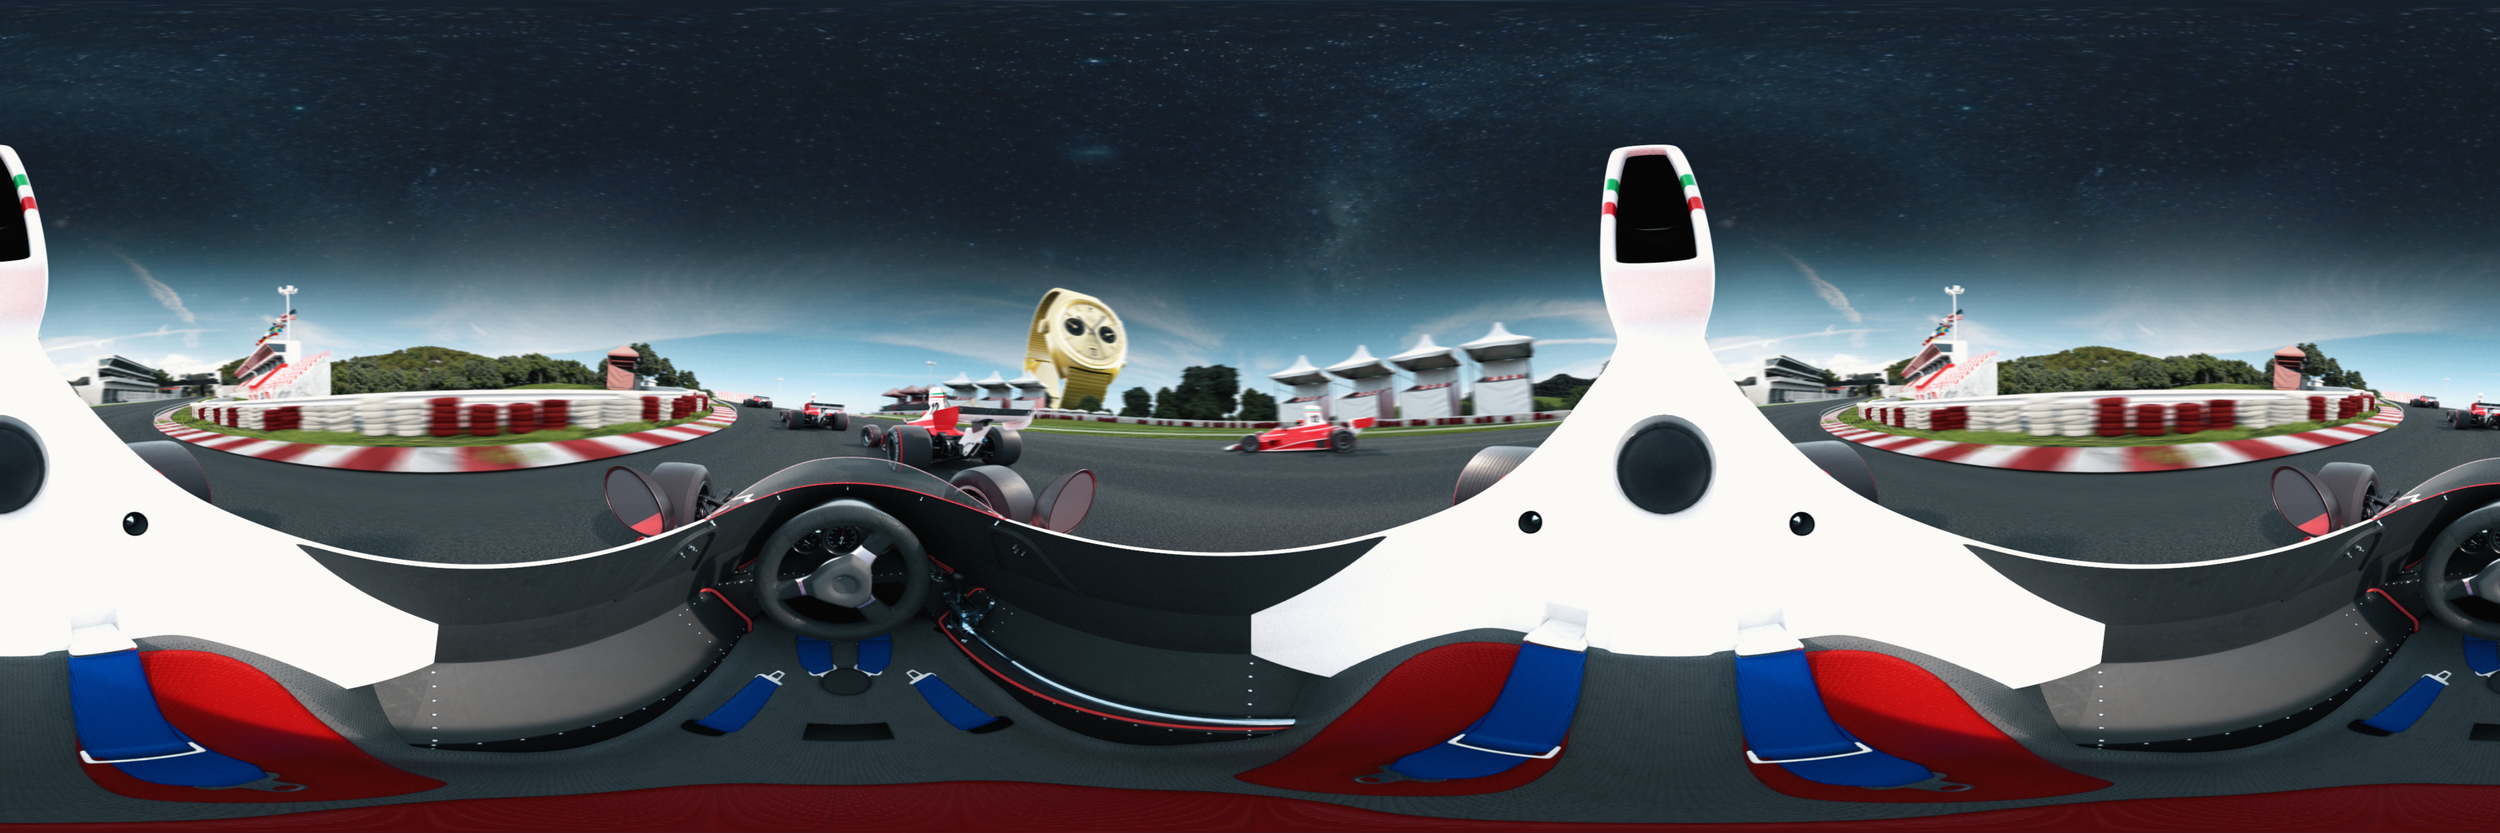 TH_VR-Panorama (03259).jpg